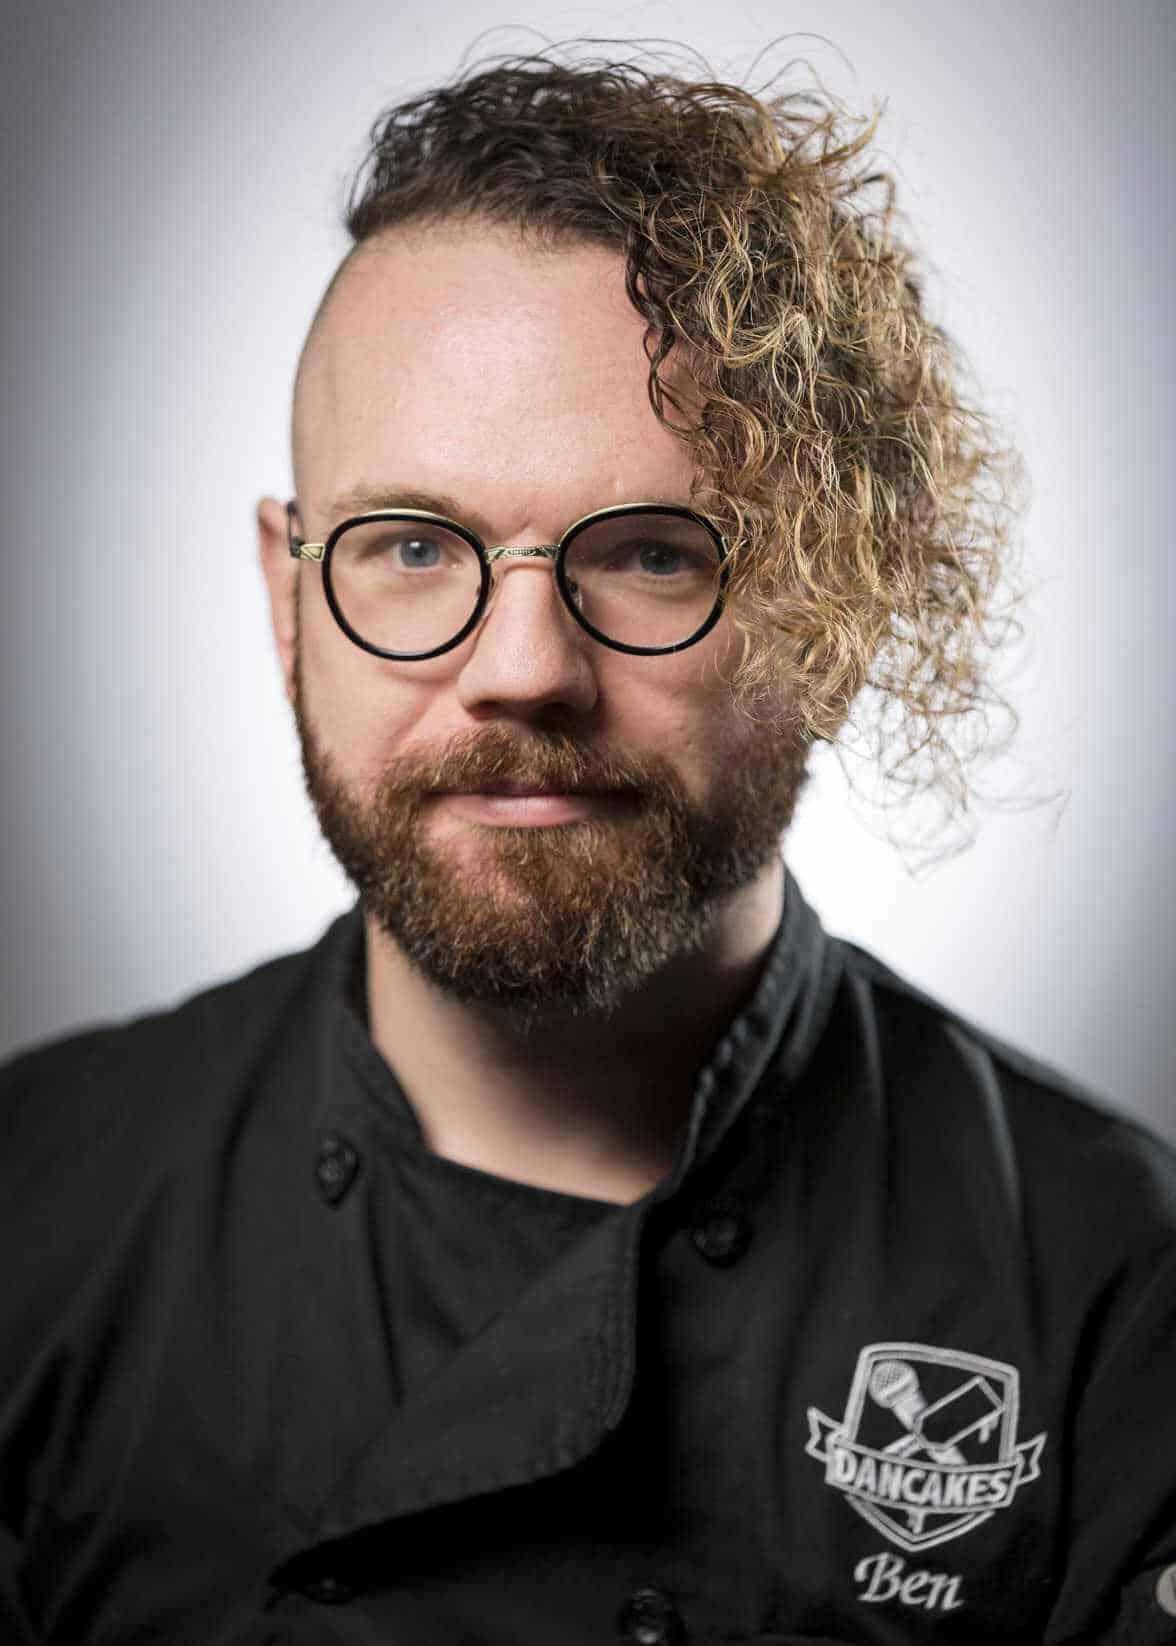 Pancake Artist Ben Daniel Headshot